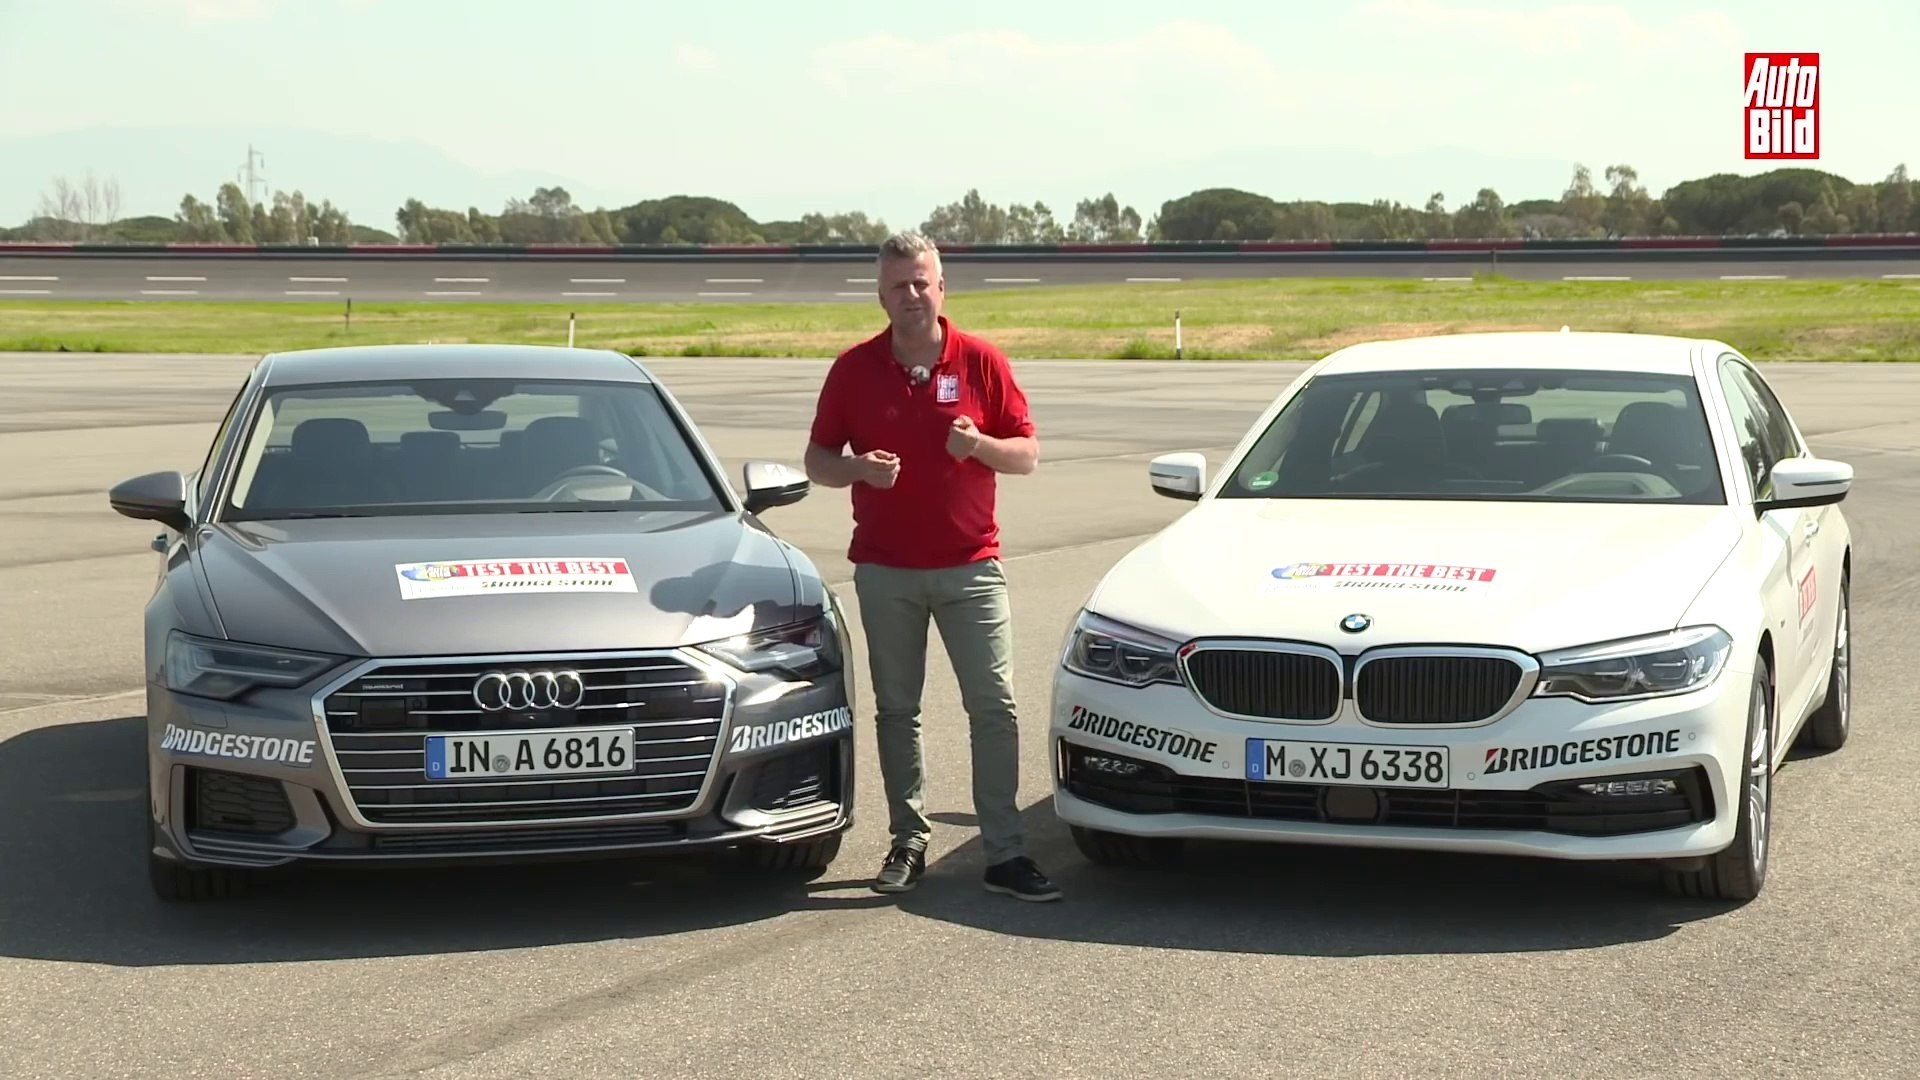 Vídeo Comparativa Audi A6 2018 Contra Bmw Serie 5 Cuál Es Mejor